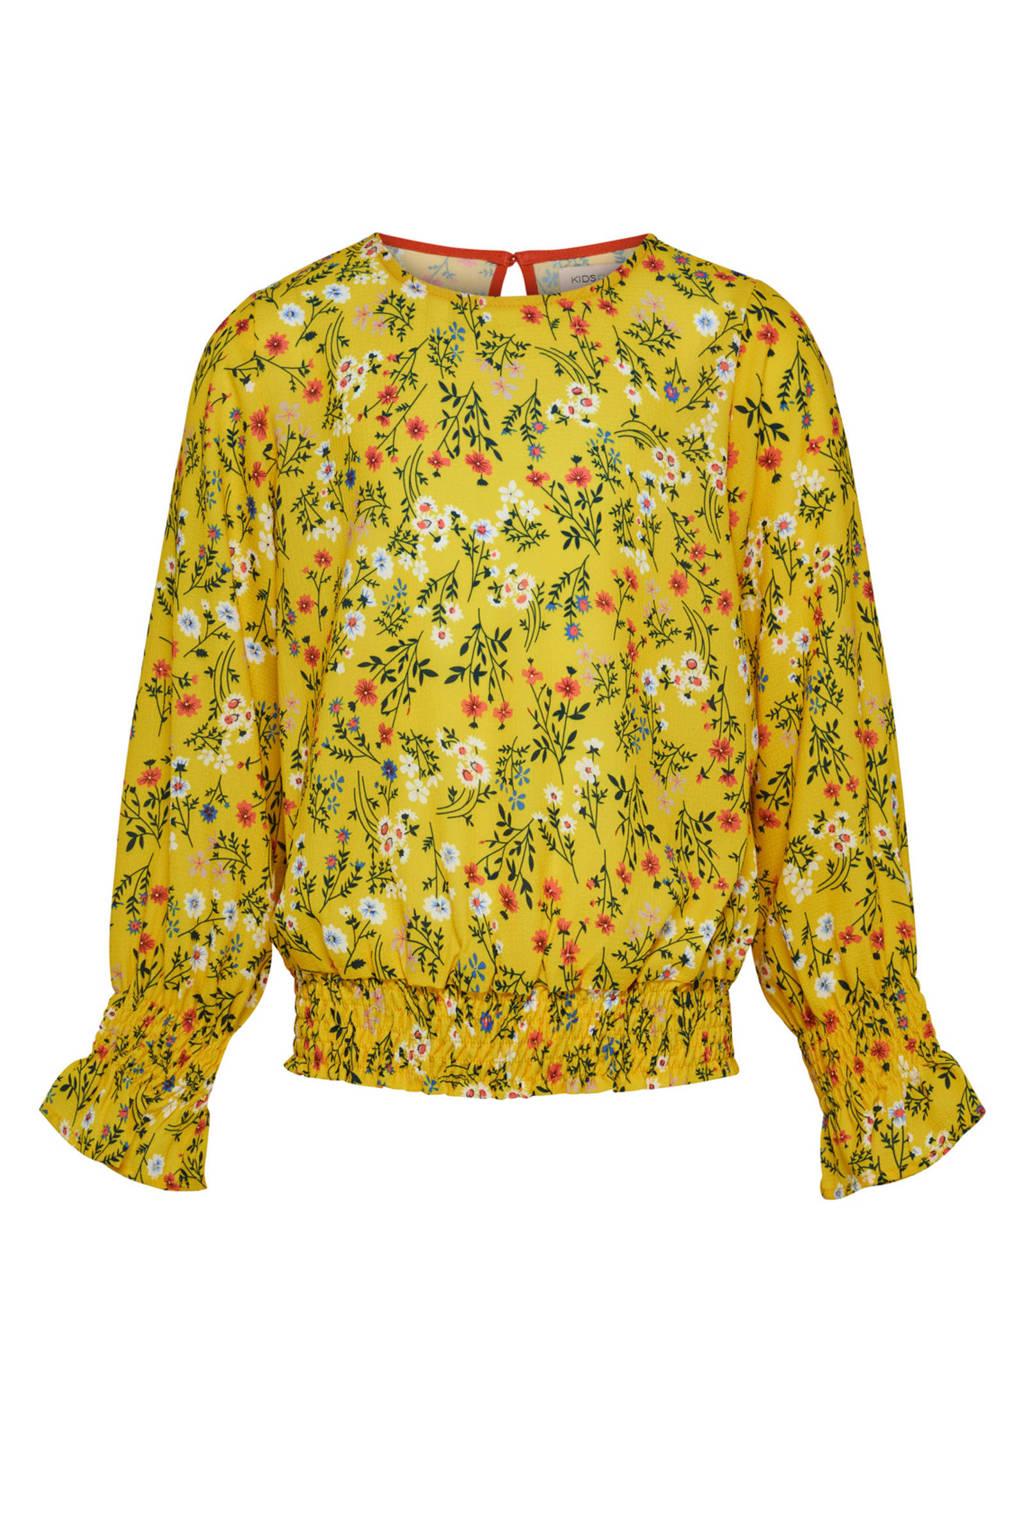 KIDSONLY geweven top Agnes met bloemendessin geel, Geel